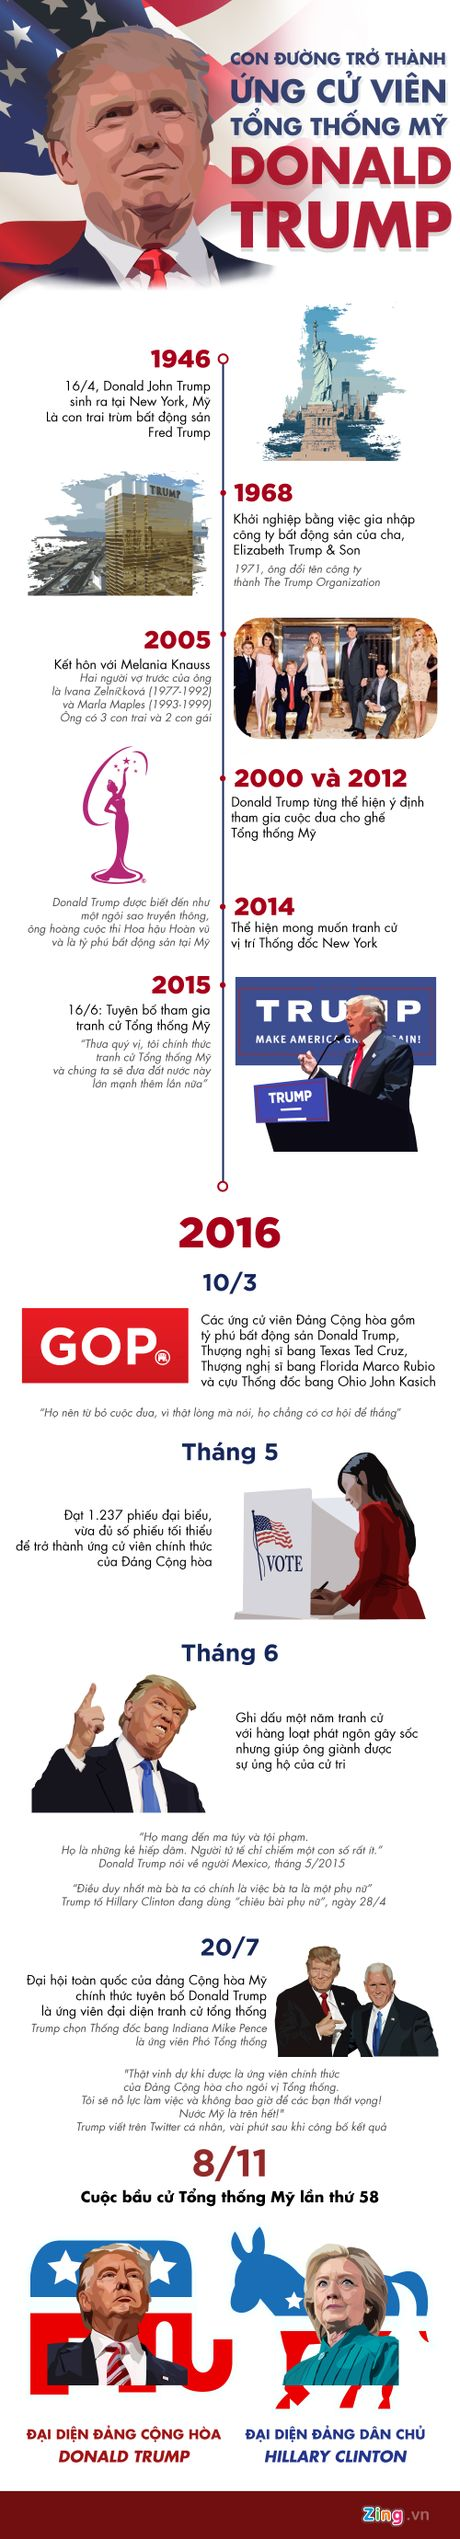 Con duong tro thanh ung vien tong thong cua Donald Trump - Anh 1